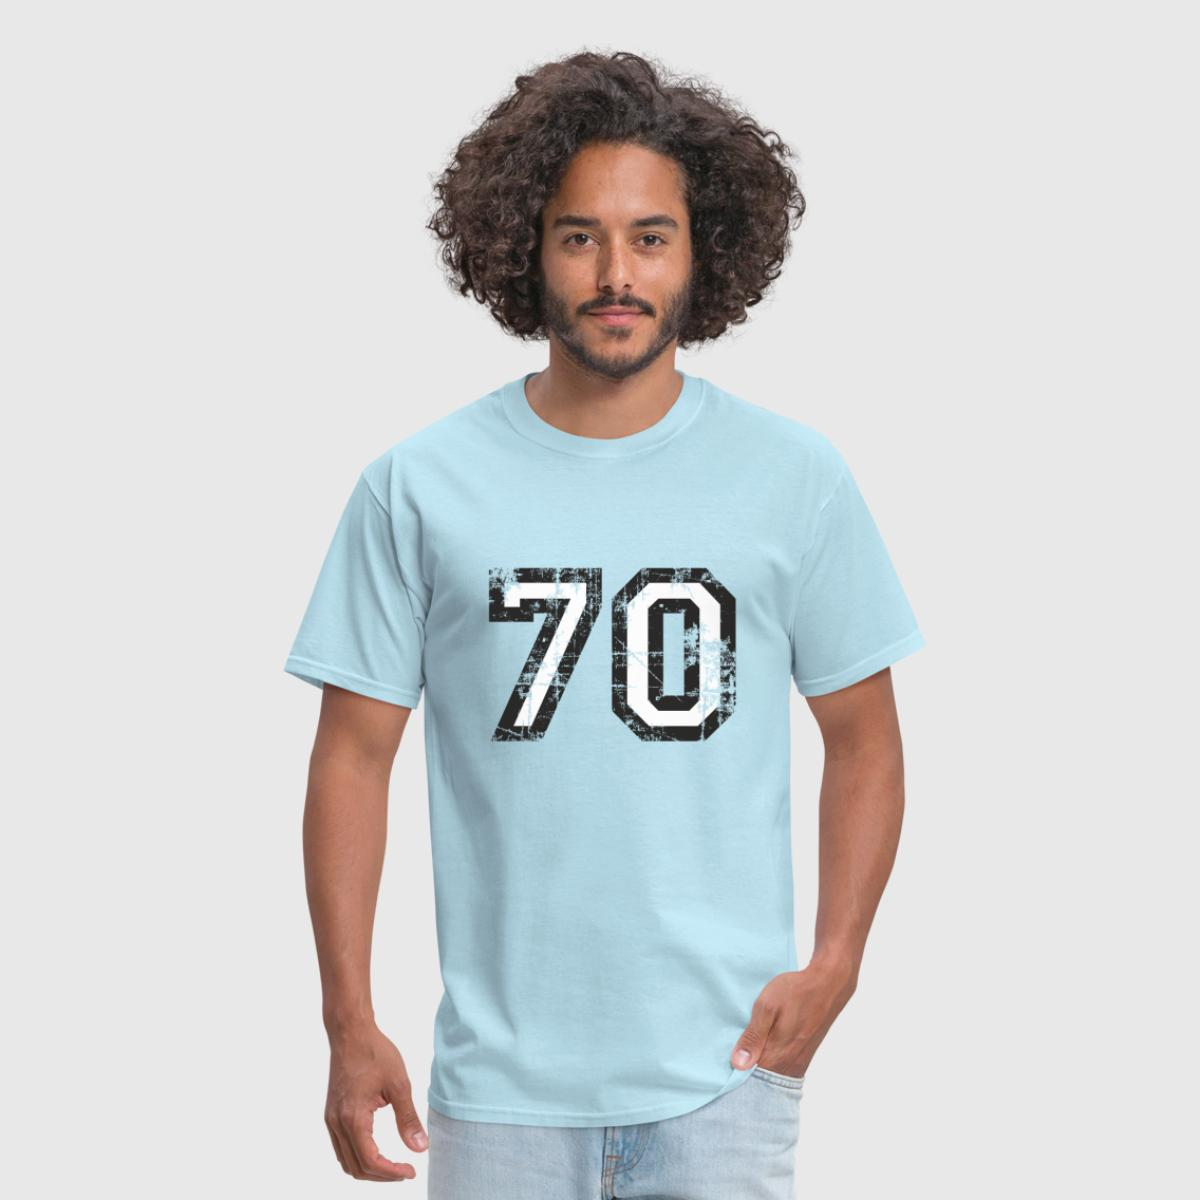 T Shirt Design For 70th Birthday